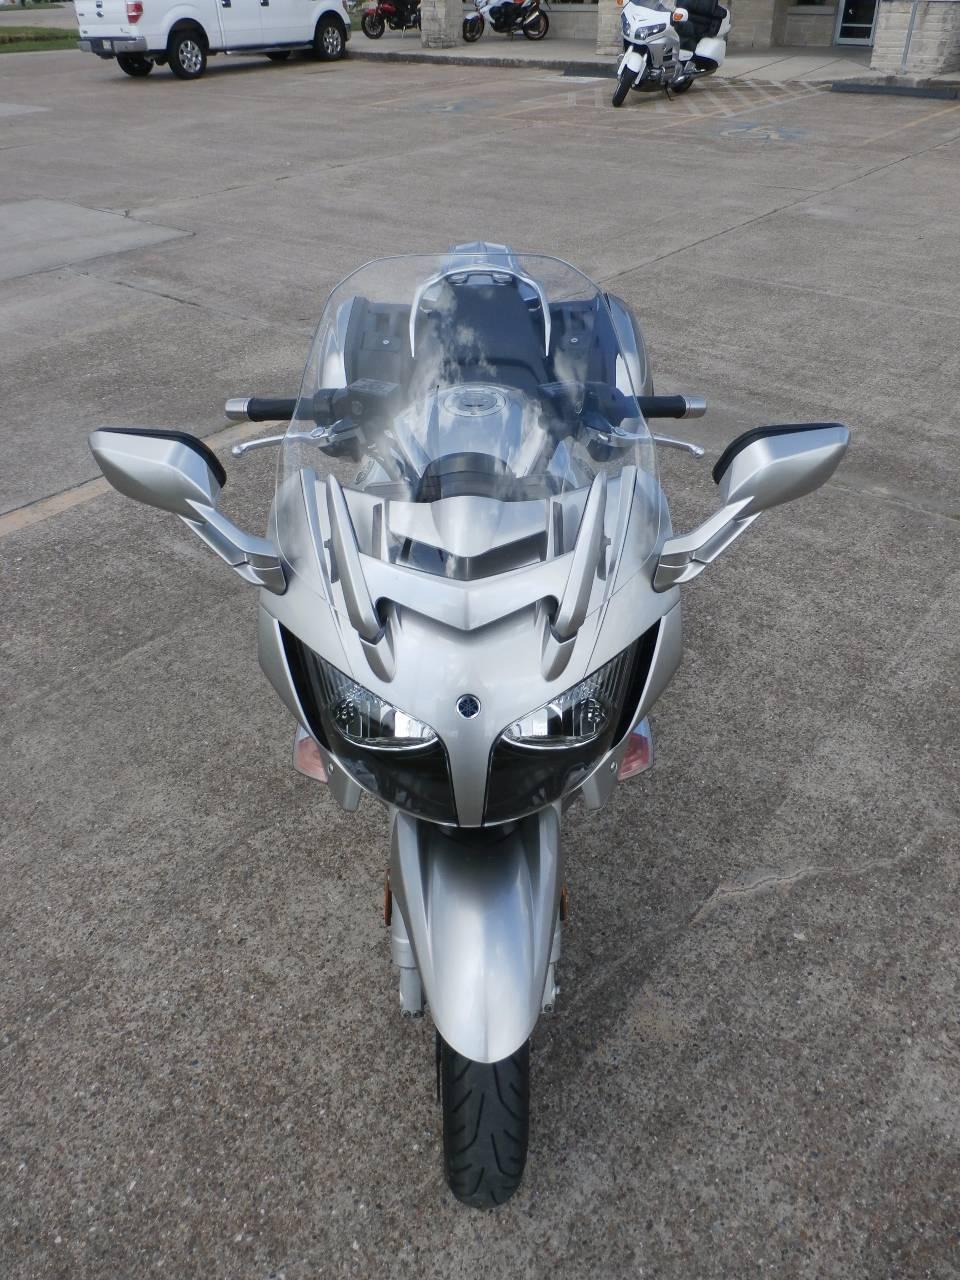 2011 Yamaha FJR1300A 11